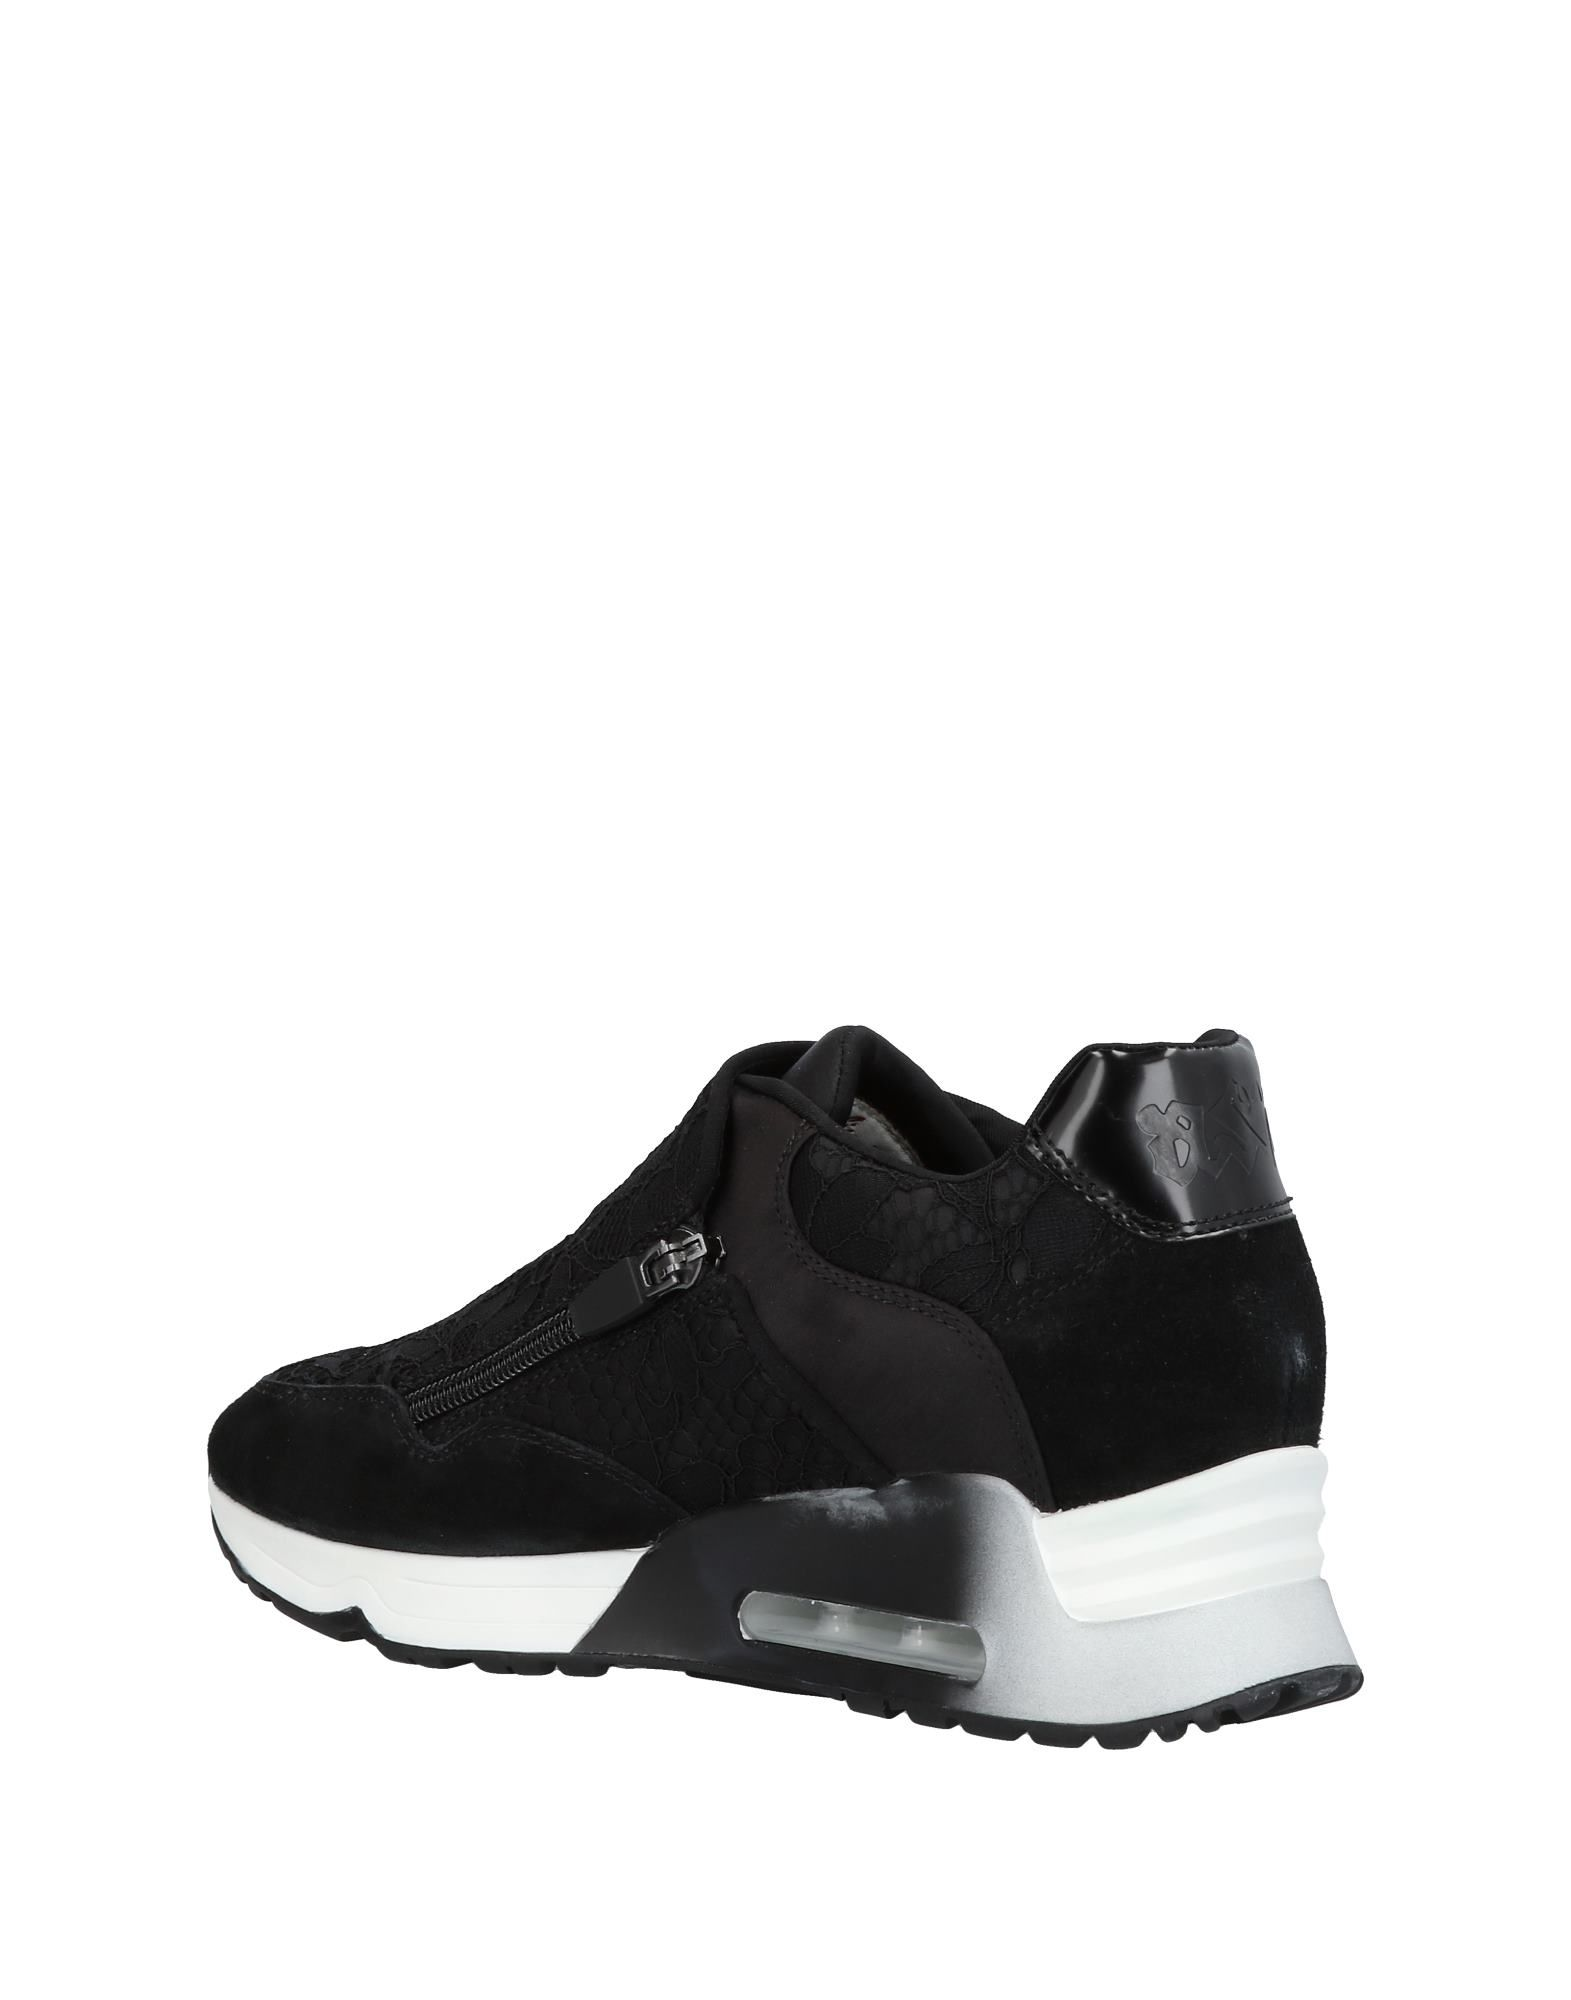 CHAUSSURES - Chaussures à lacetsGrelis Shoes 15oNB